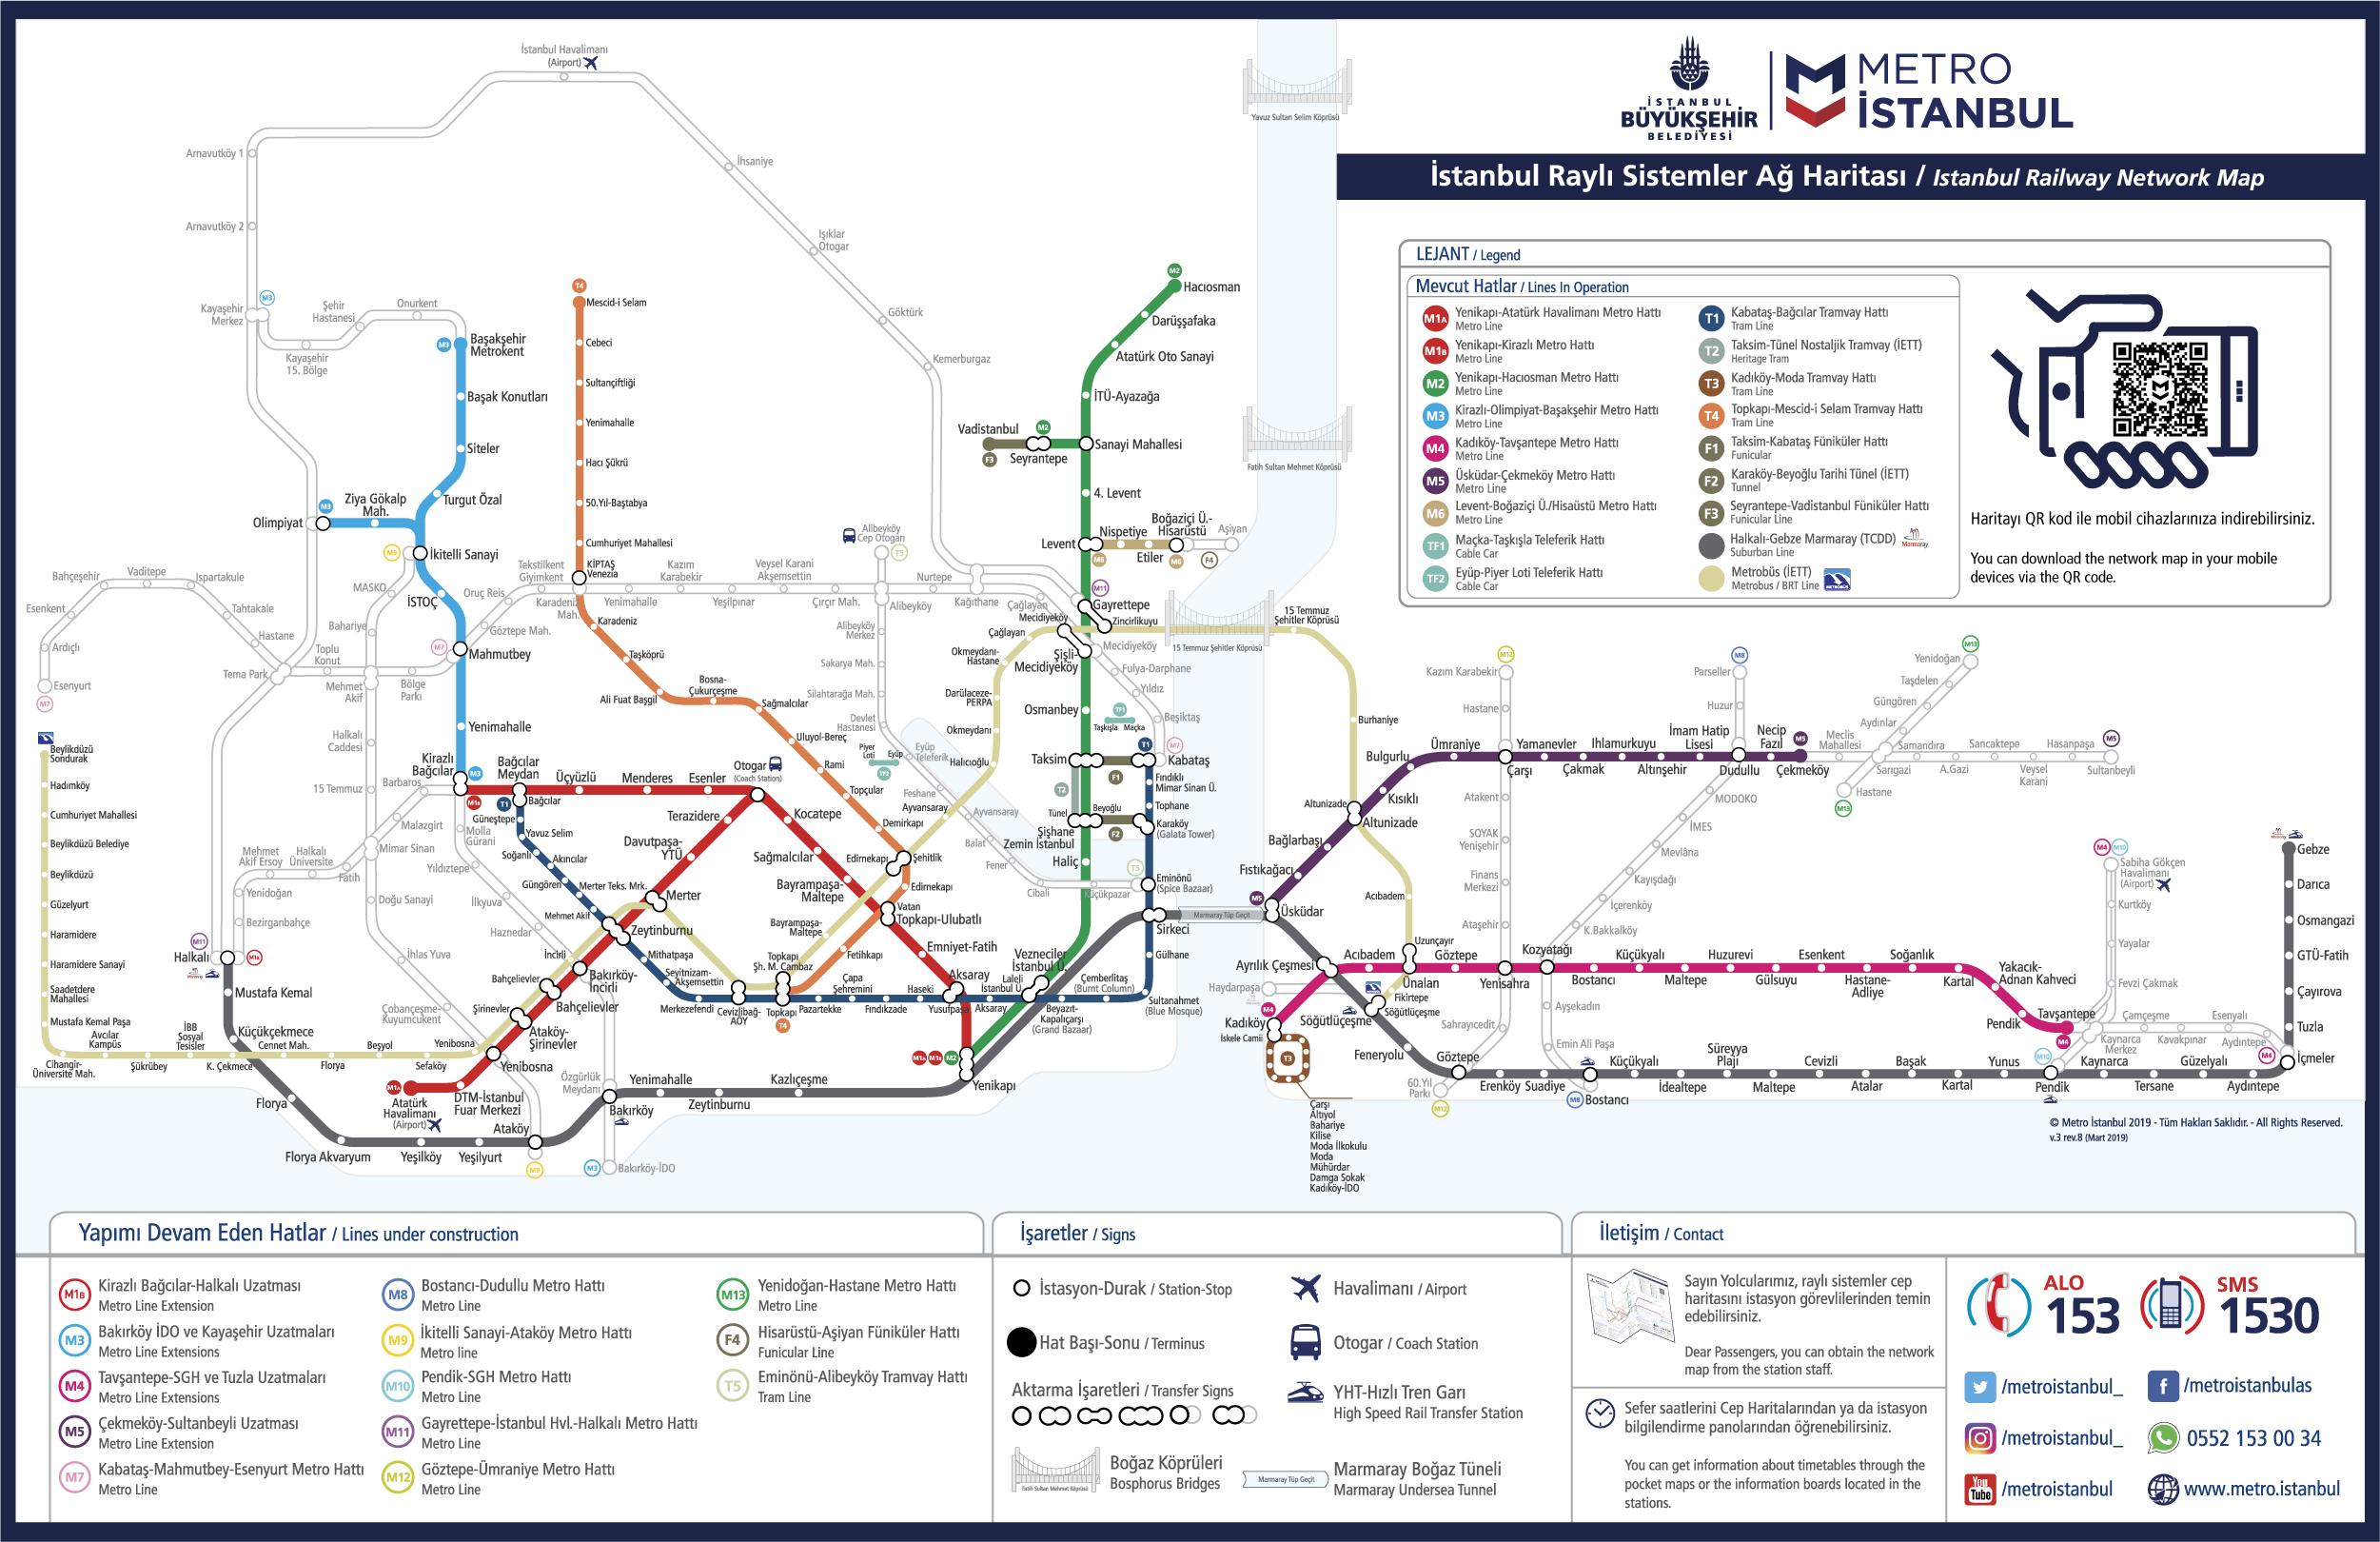 Istanbul Rail System Map ©️ Metro Istanbul